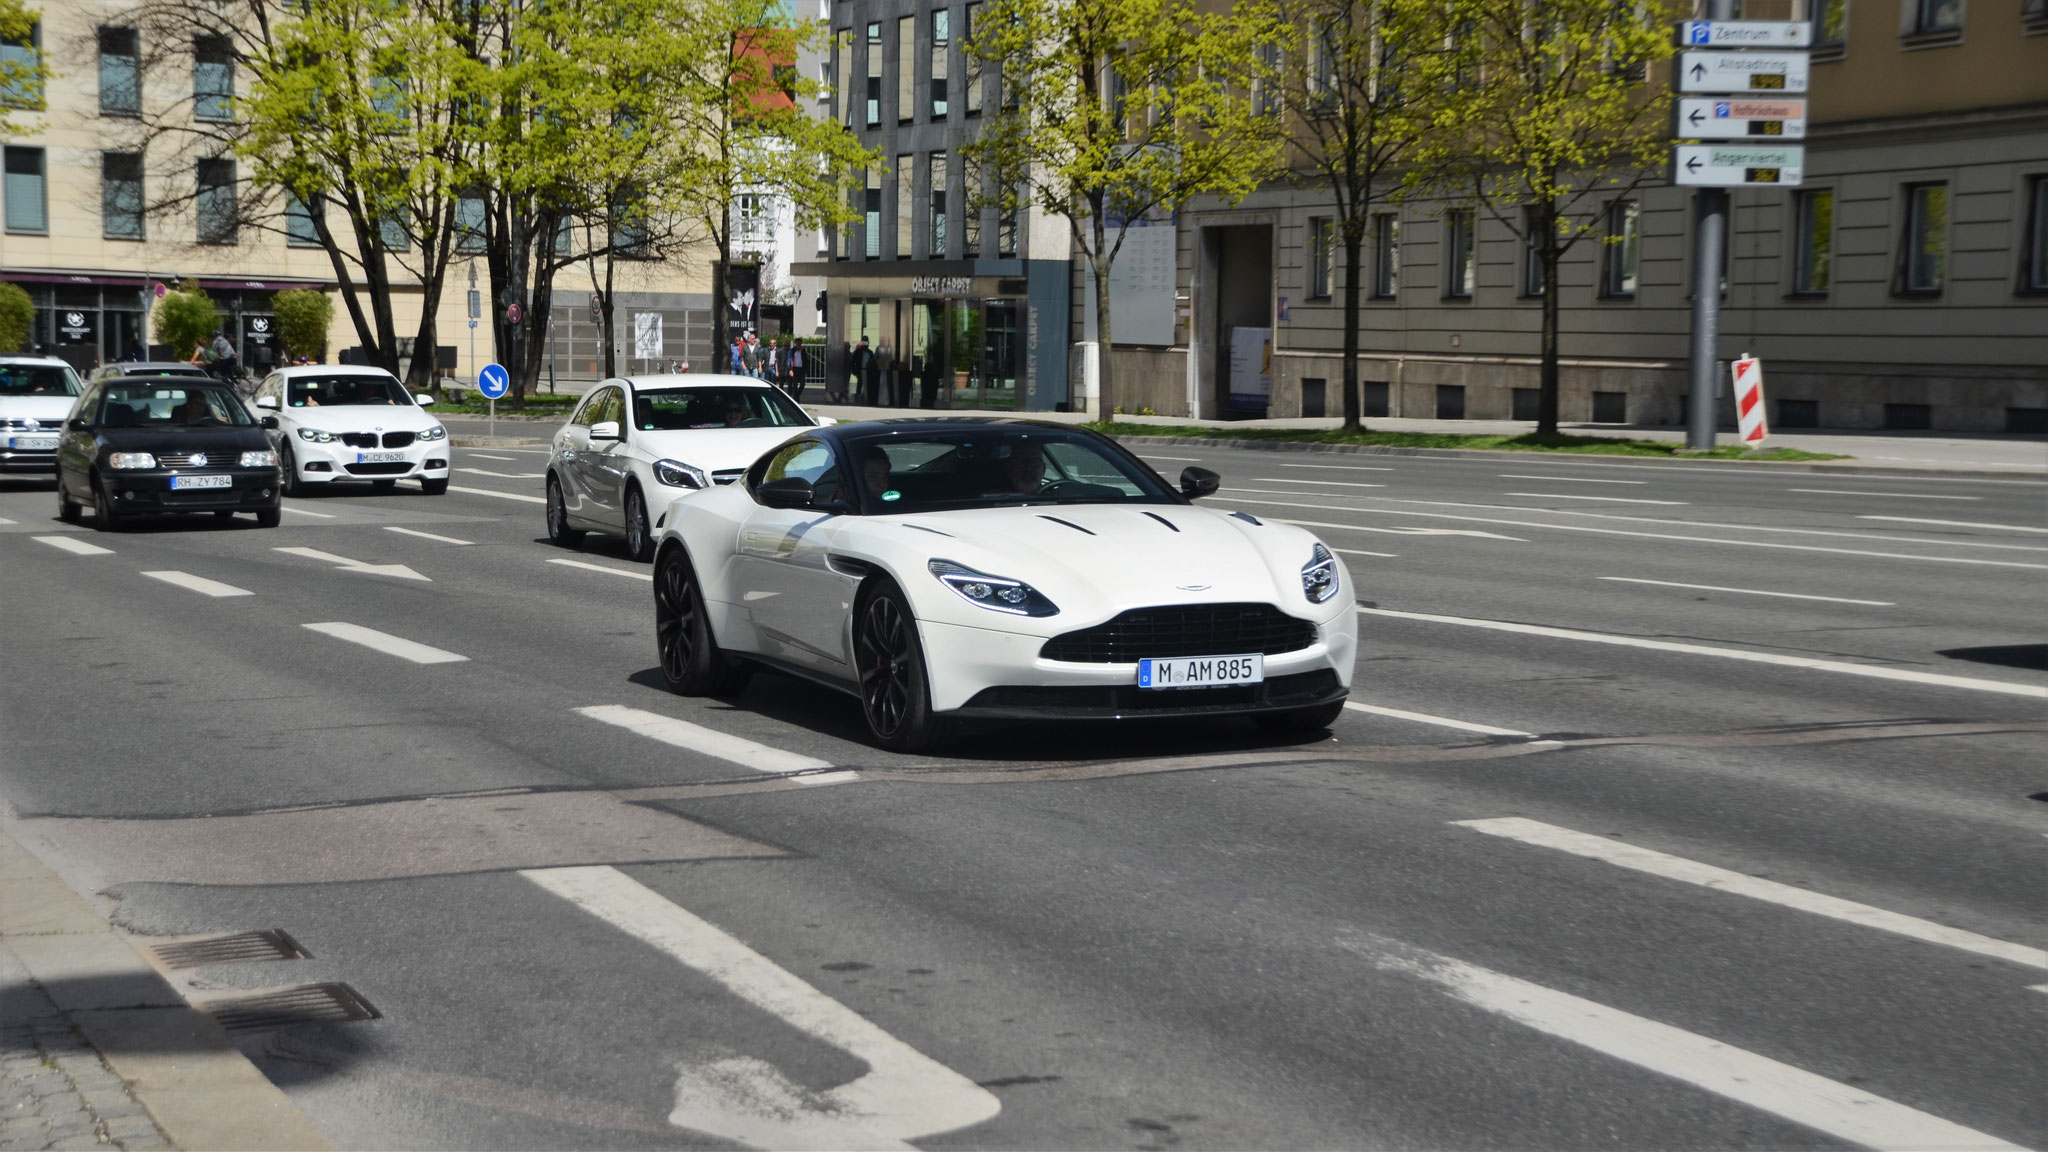 Aston Martin DB11 - M-AM-885